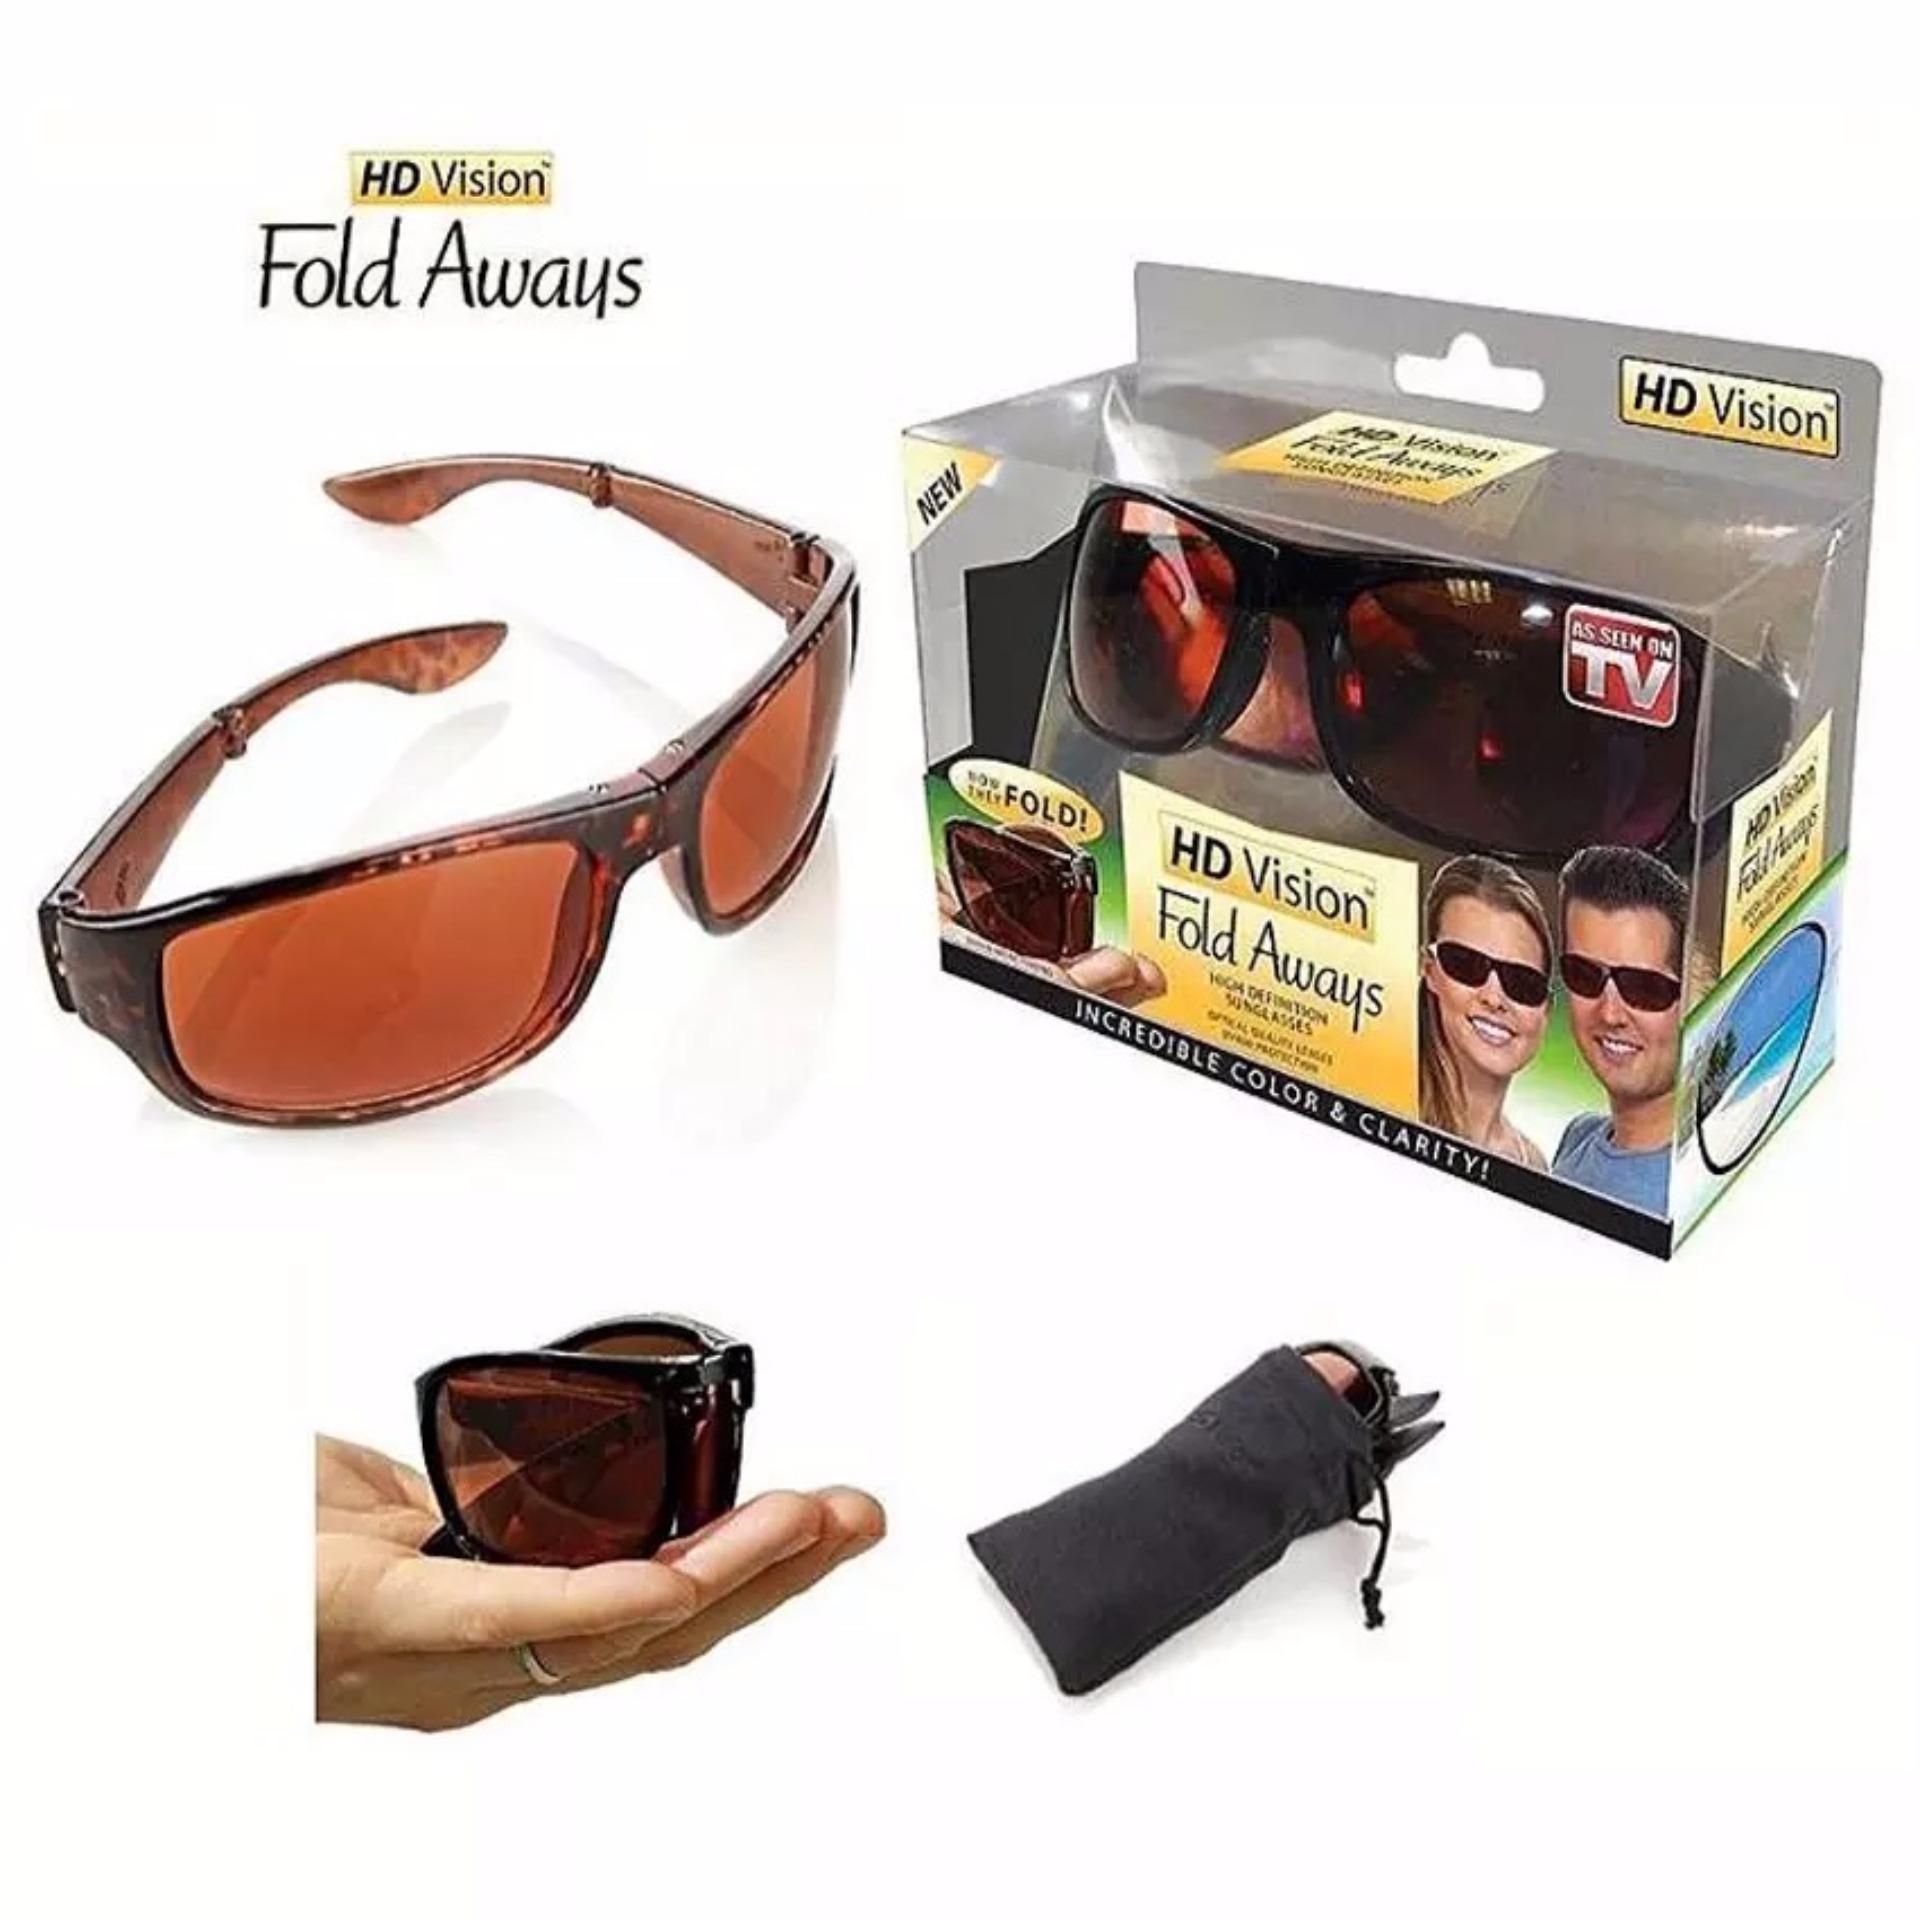 Harga Penawaran Kacamata Lipat Anti Silau Hd Vision Fold Aways Sunglasses Isi 2 Pcs Sunglass Wrap Arounds Hitam